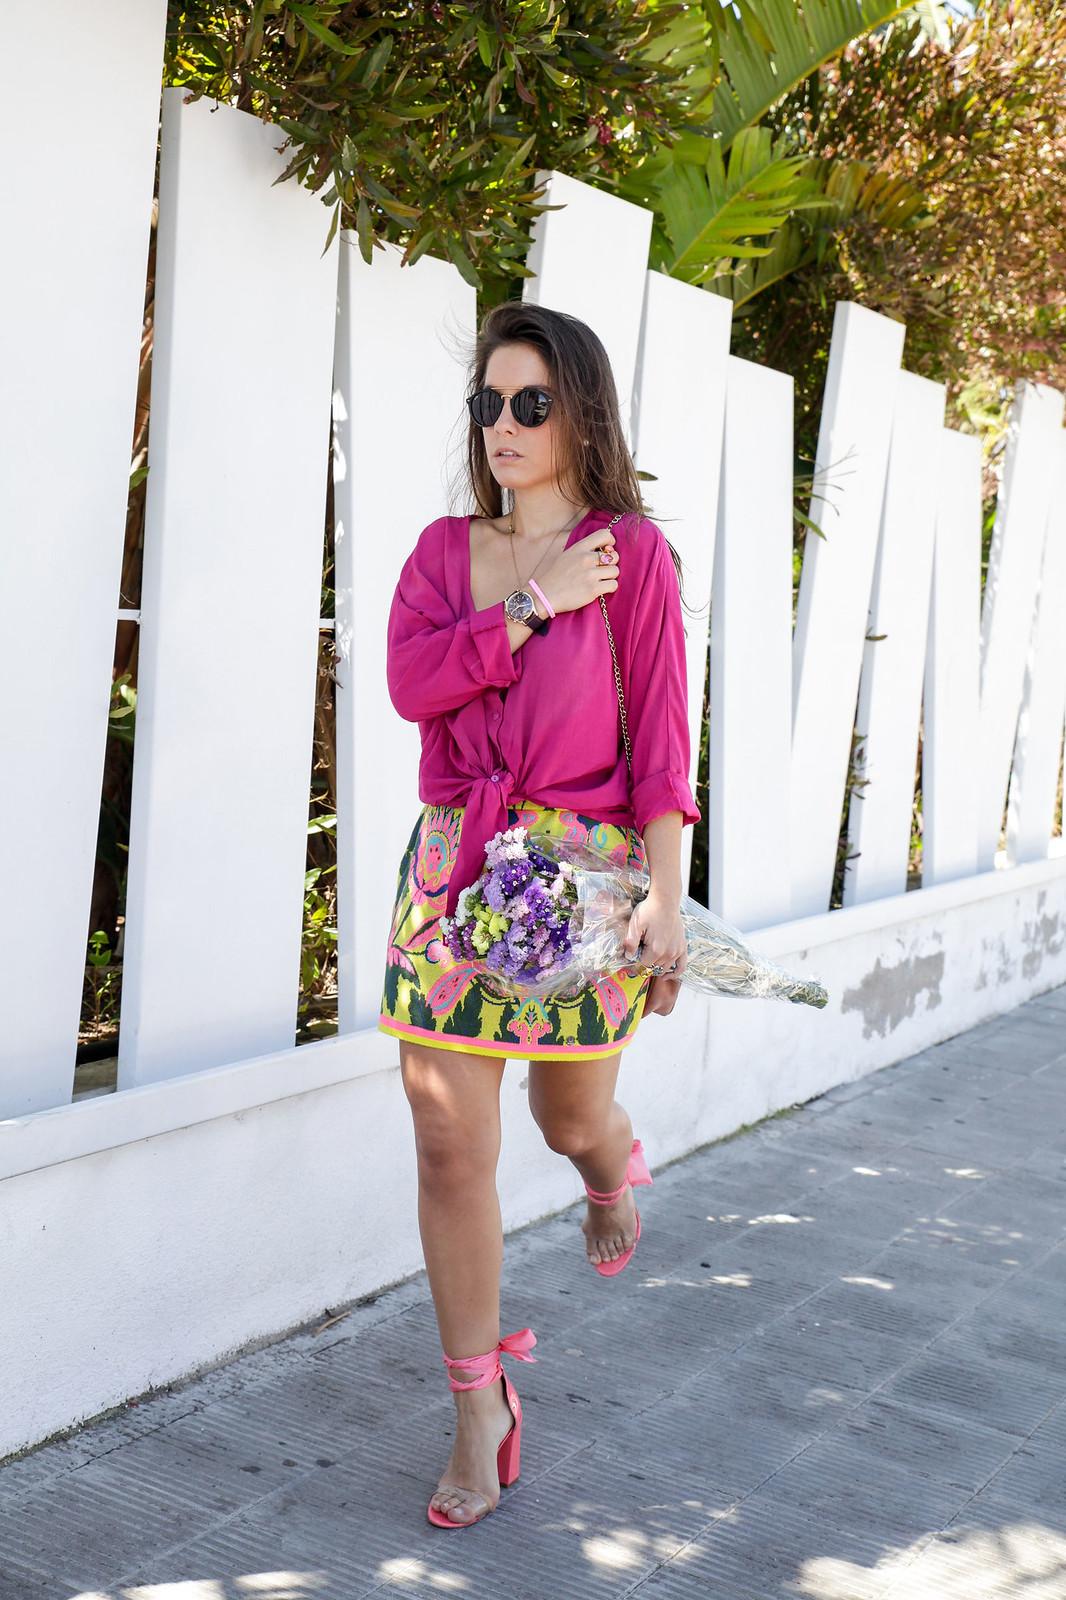 015_blusa_magenta_falda_amarilla_outfit_ruga_summer17_theguestgirl_influencer_barcelona_portugal_brand_ambassador